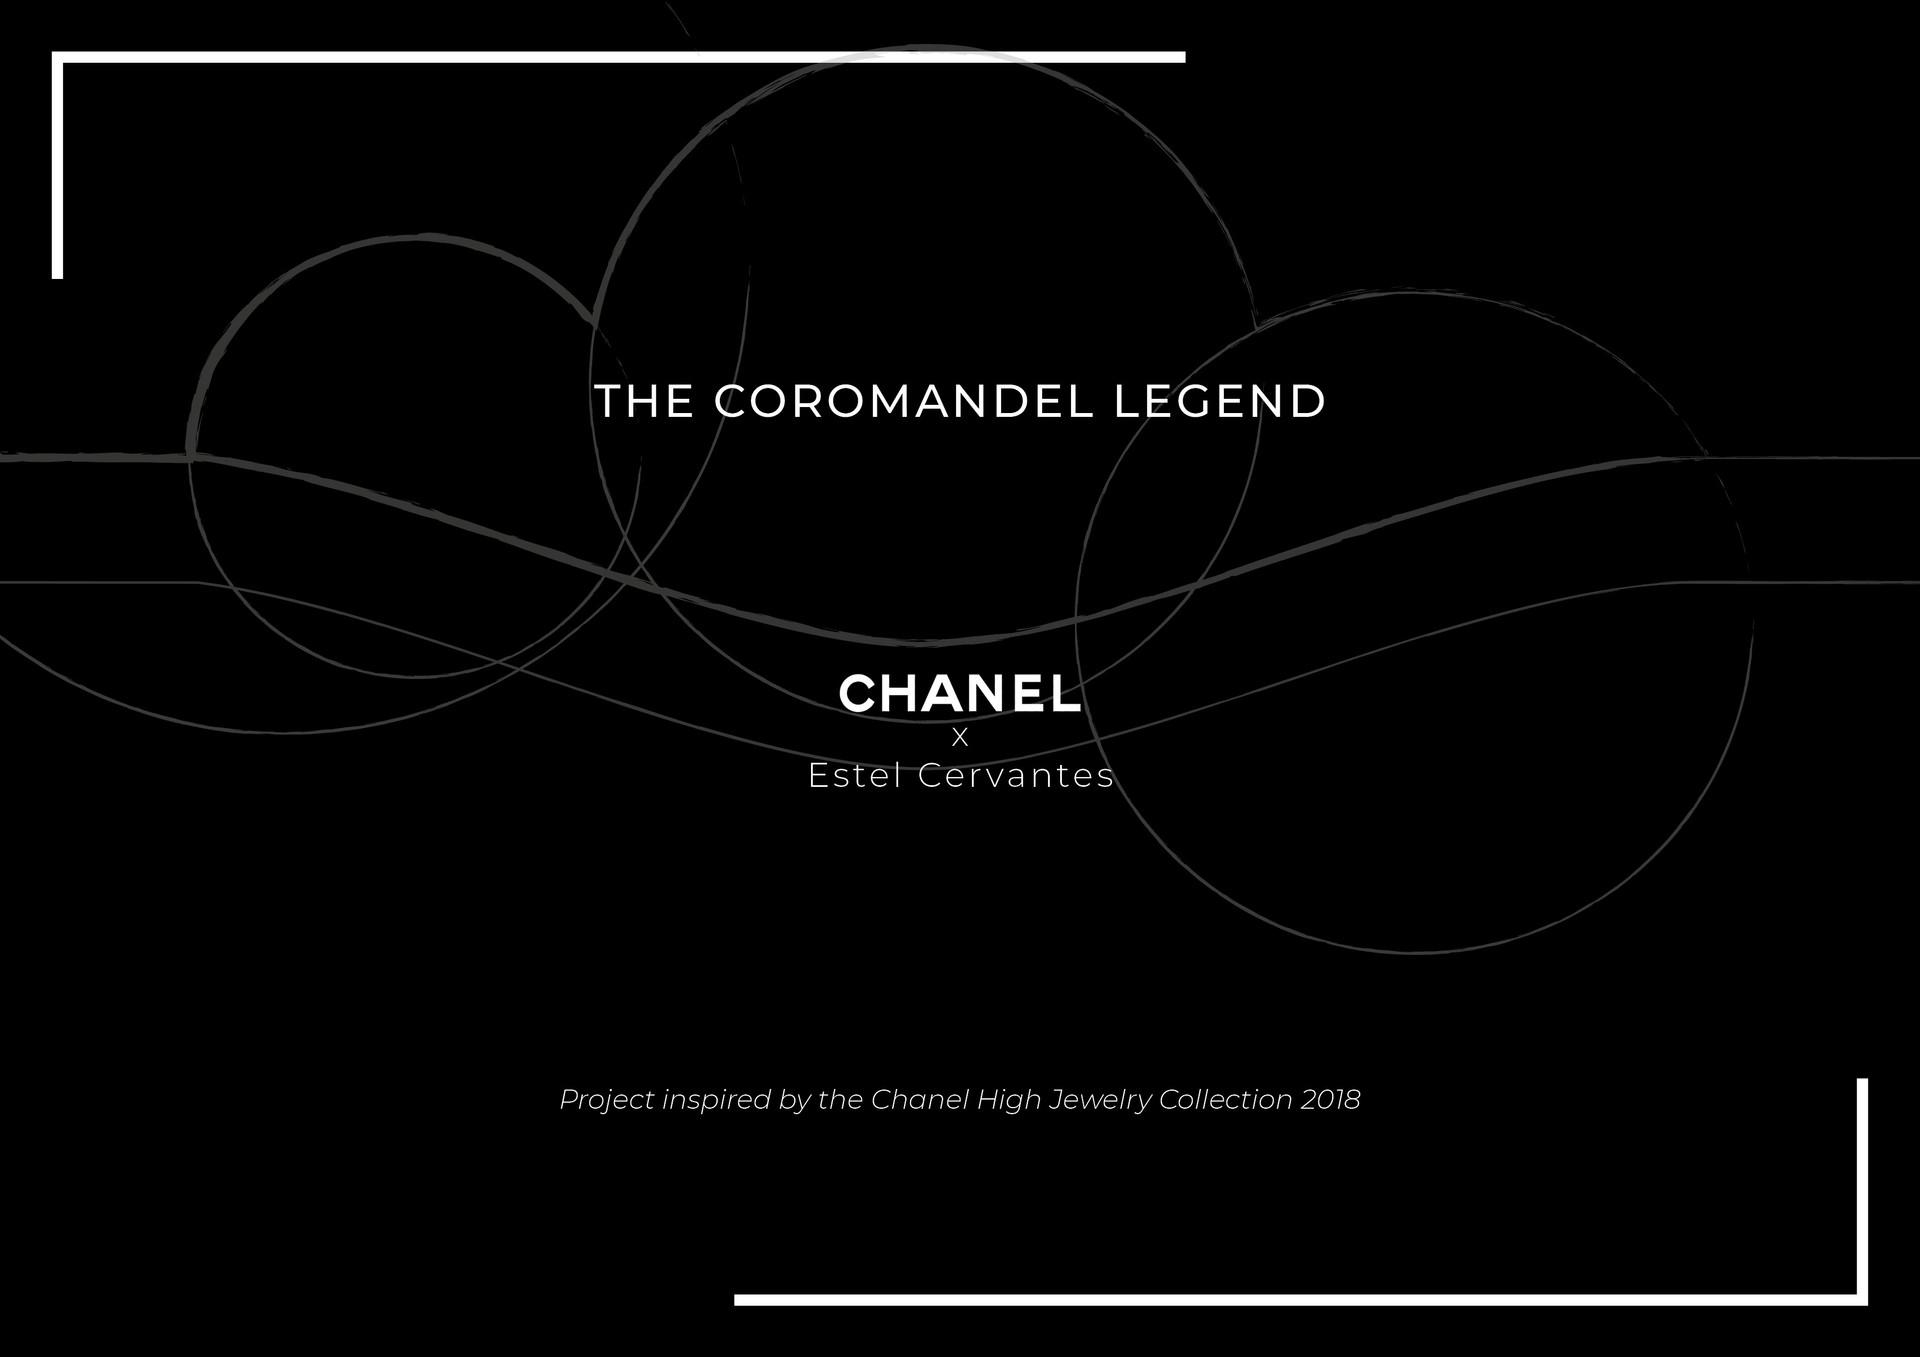 Chanel High Jewelry 2018 - Coromandel Co